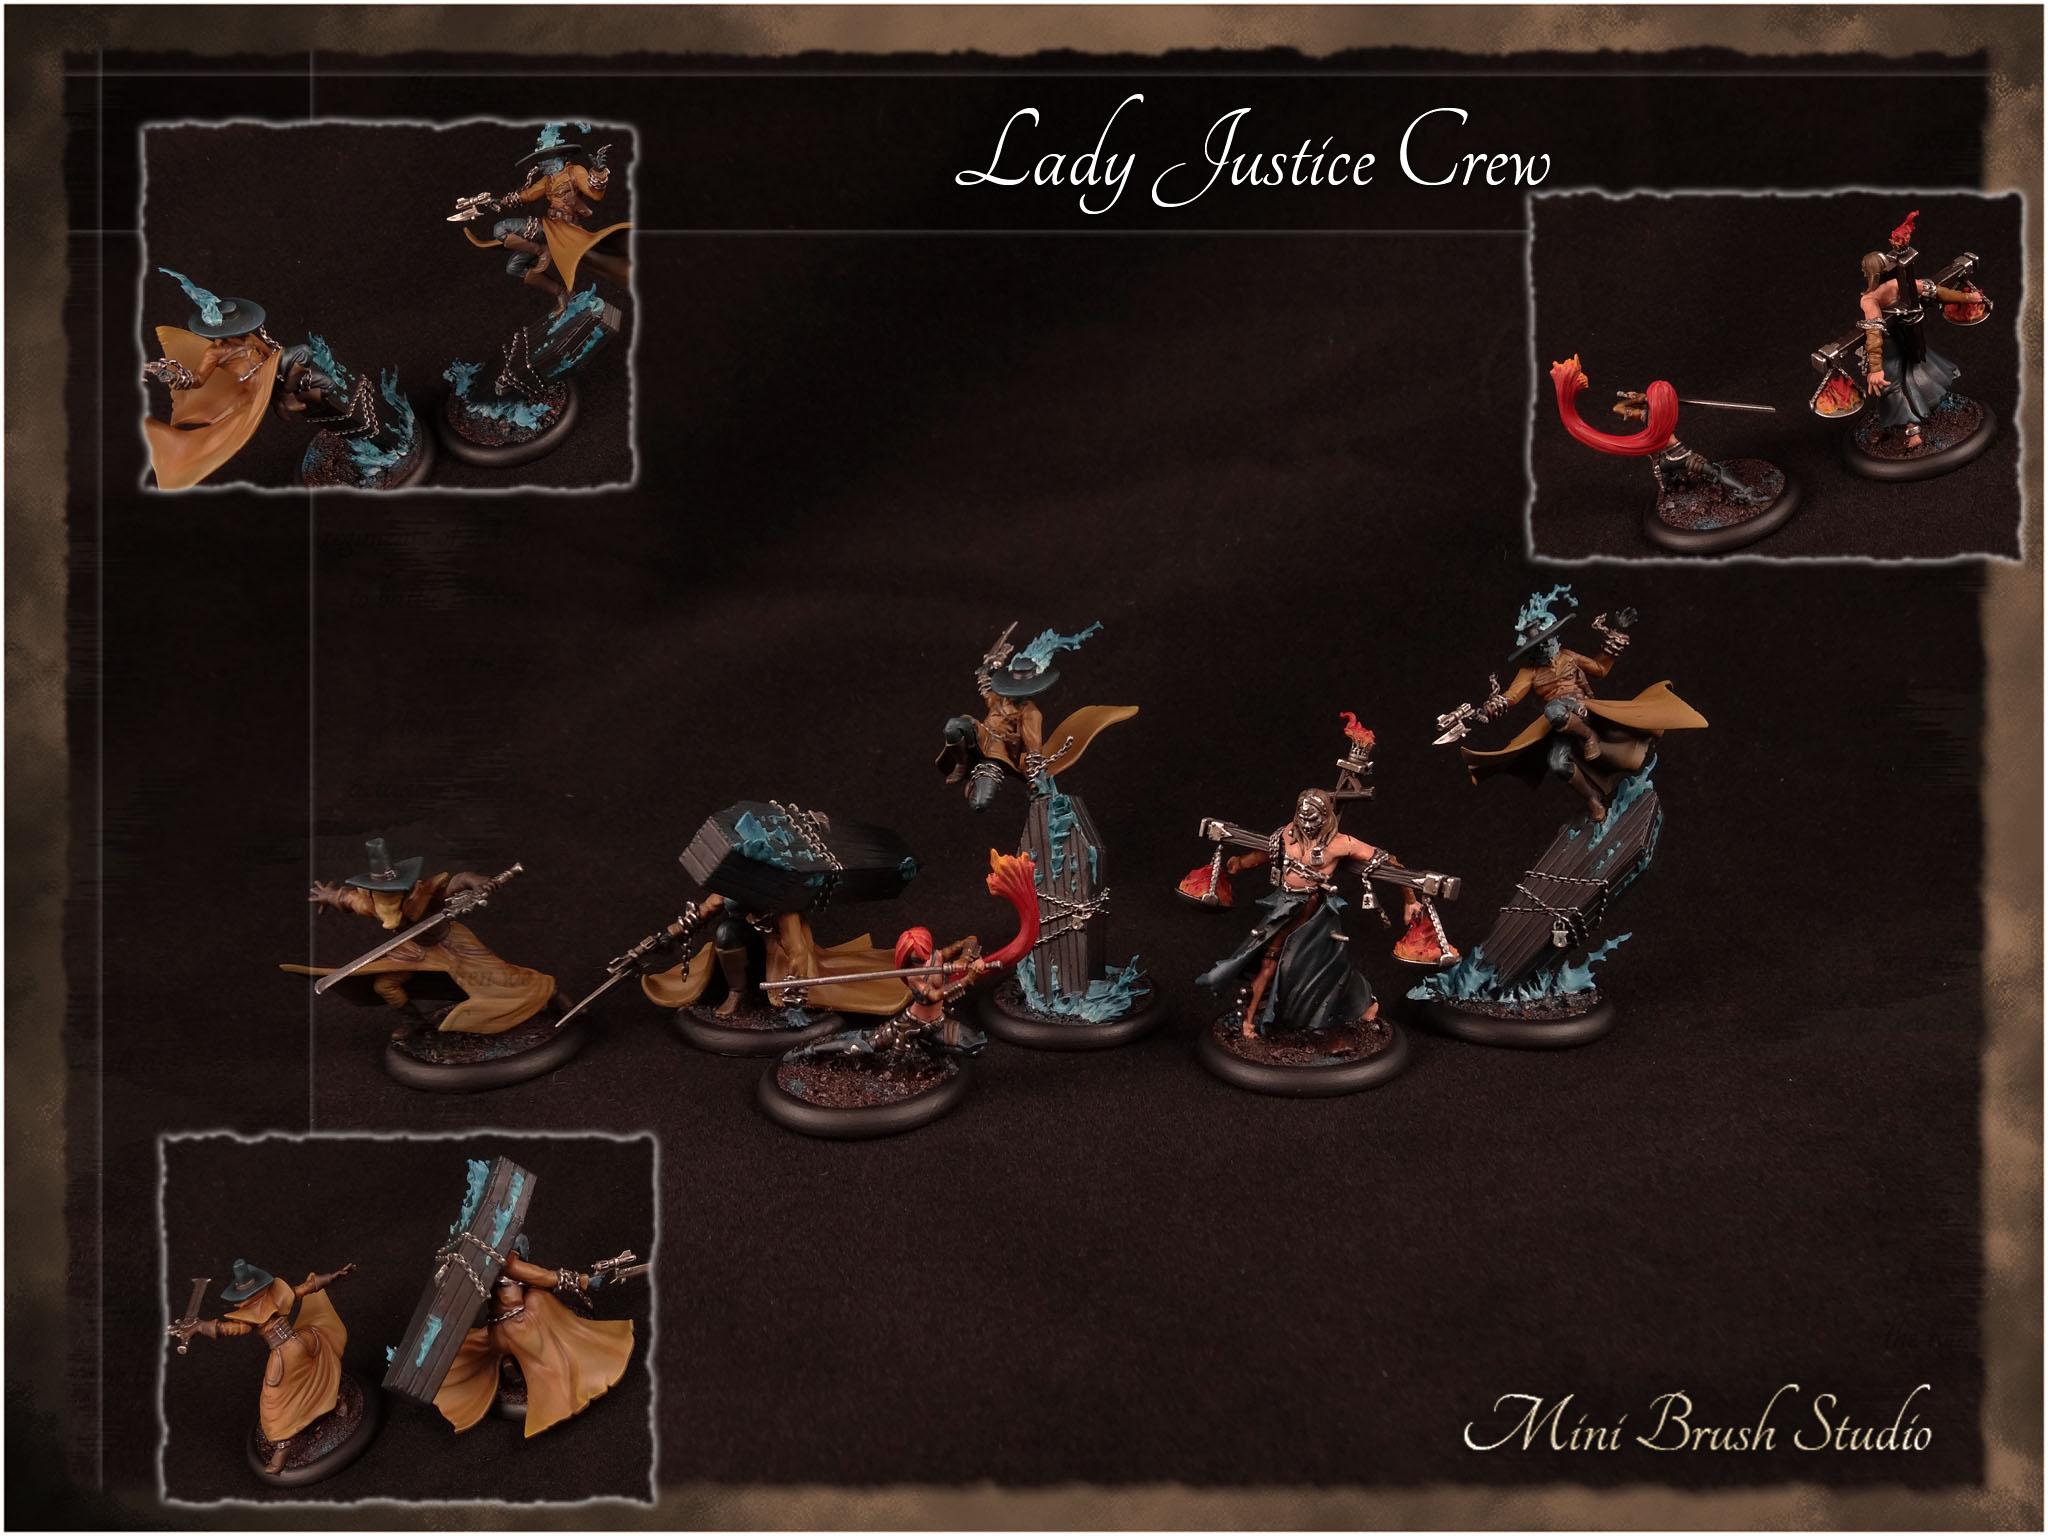 Lady Justice Crew 1 v7.jpg